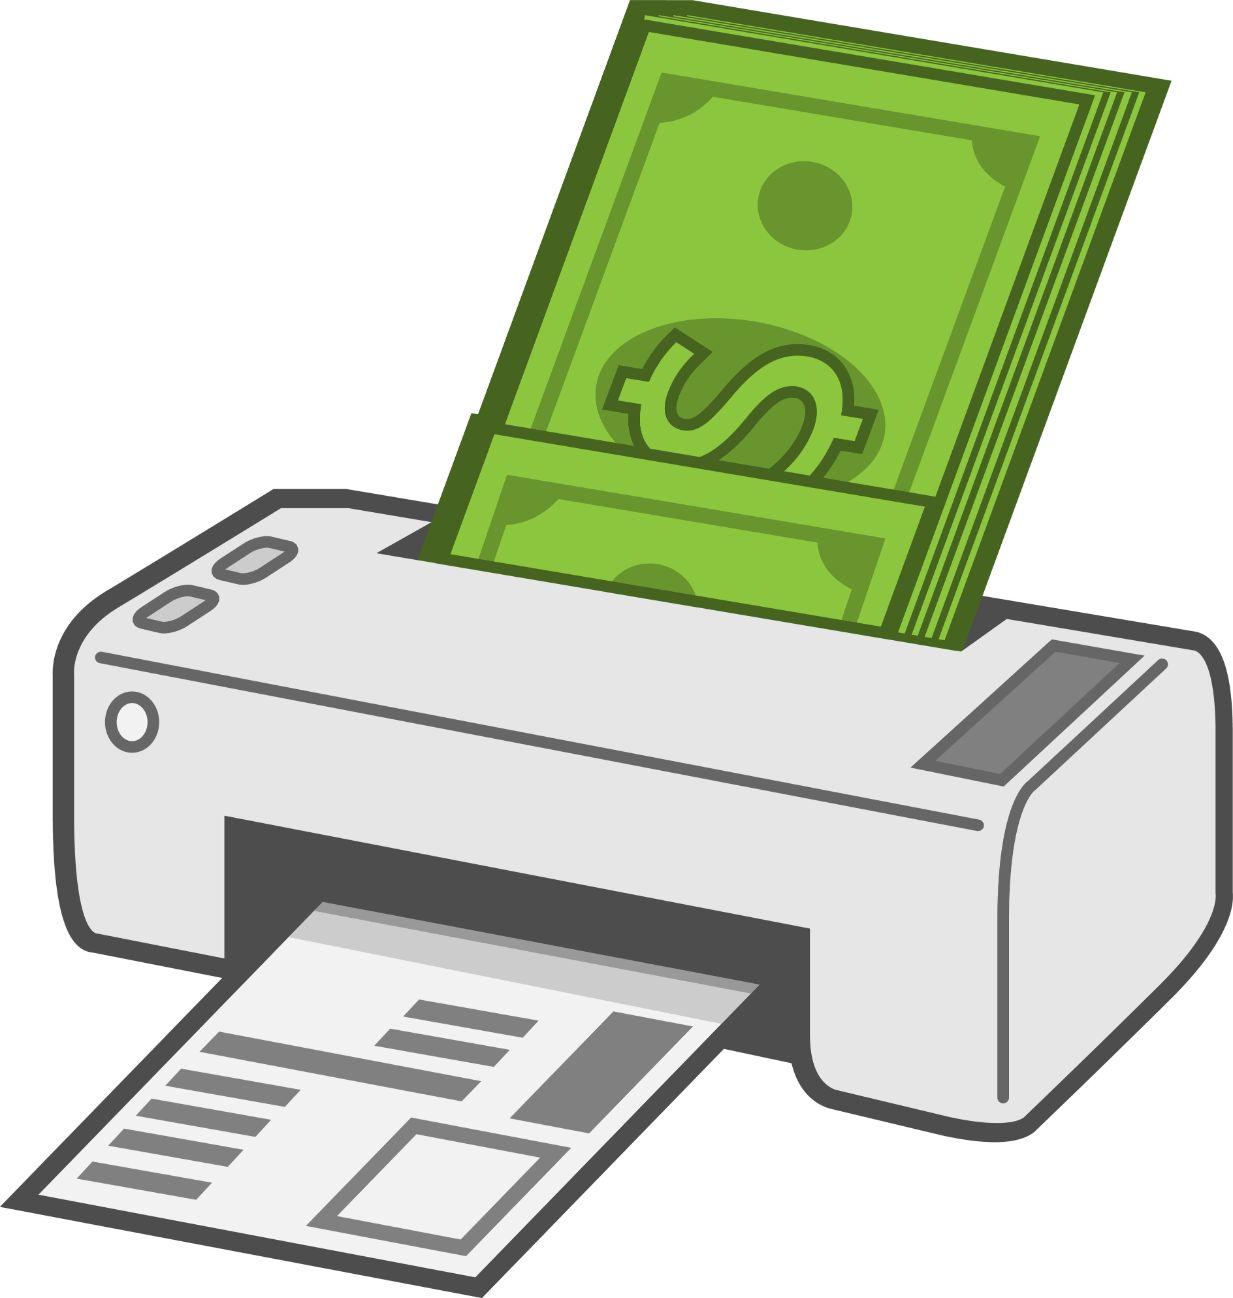 Reduce MFP Expense